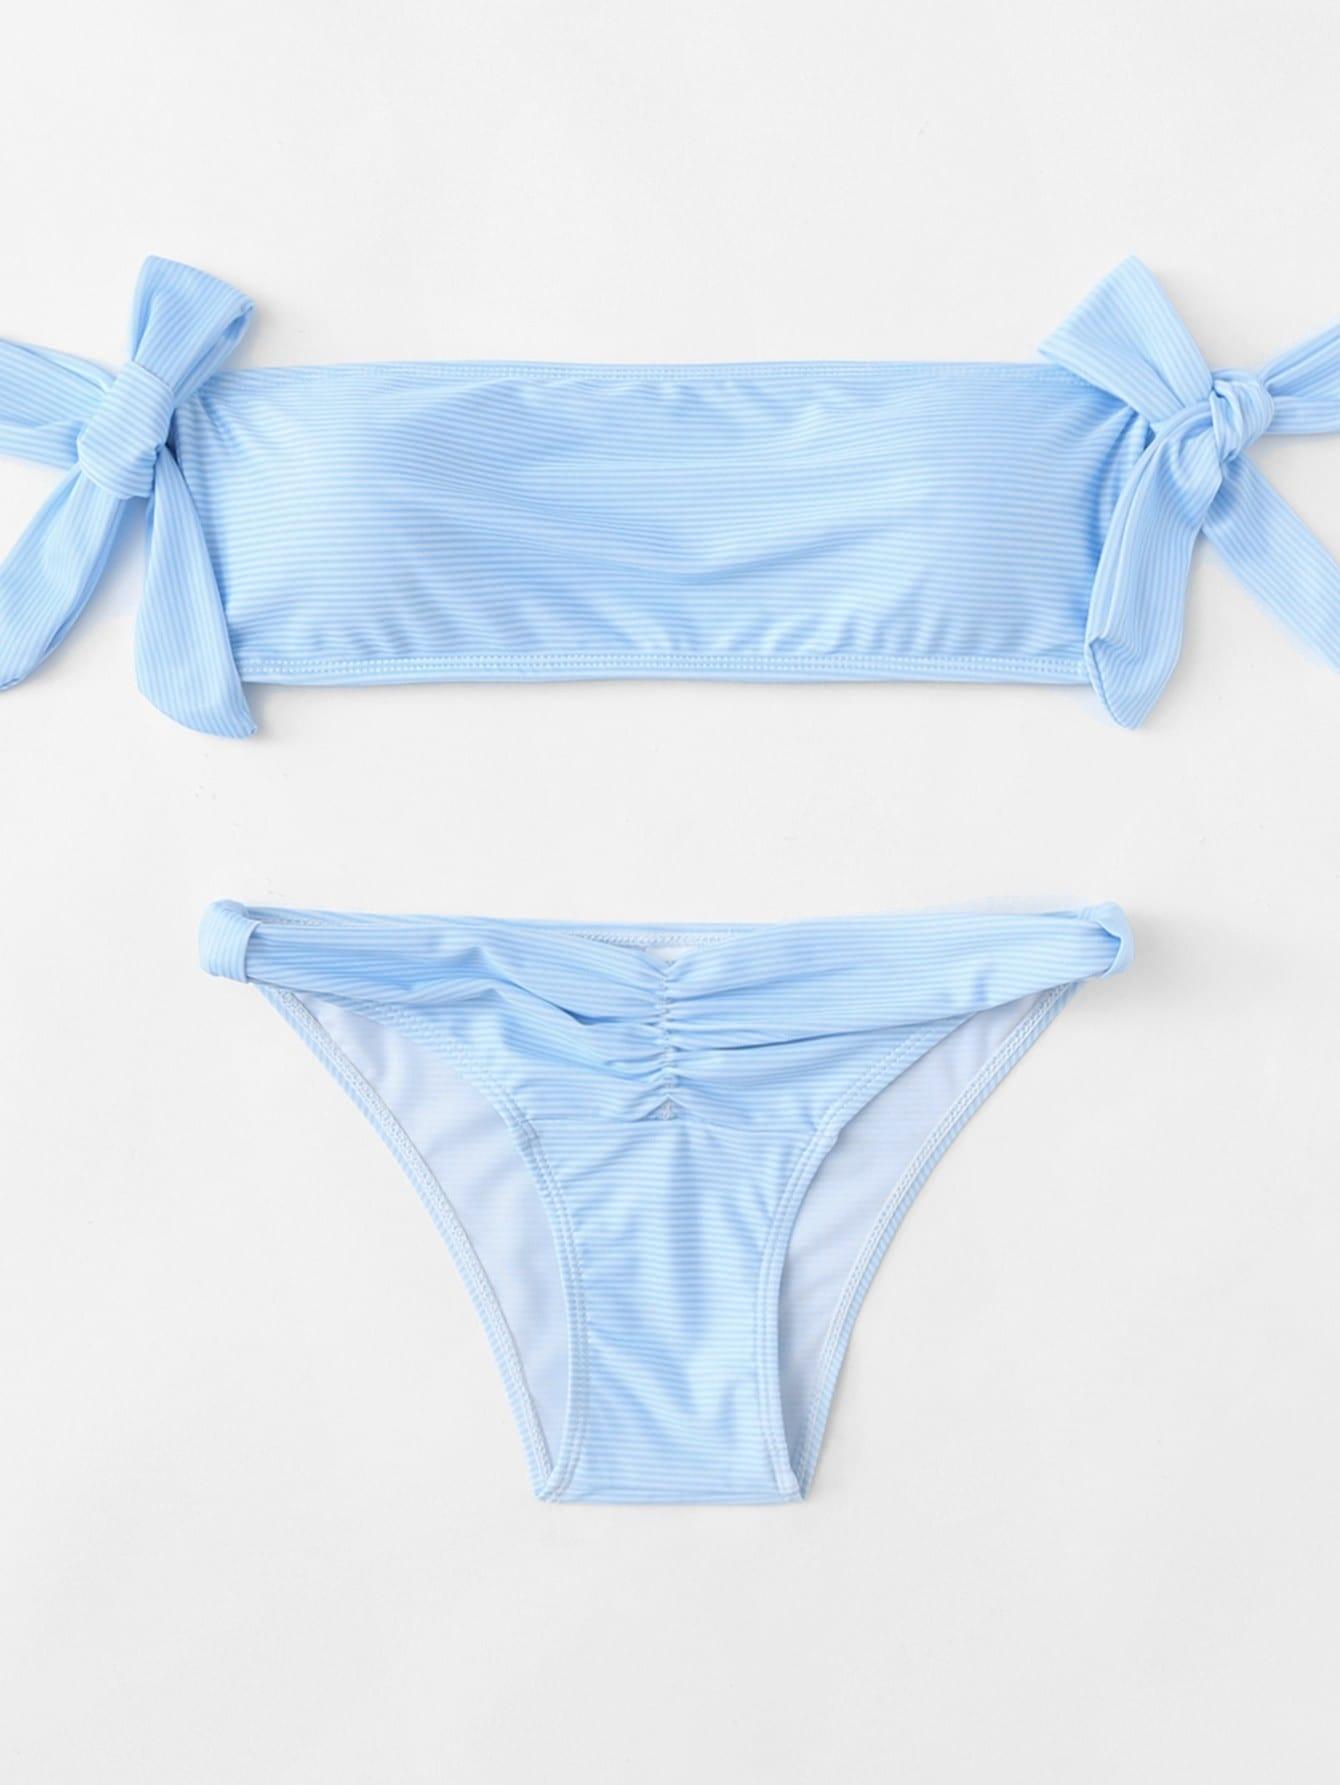 Bow Tie Striped Bardot Bikini Set